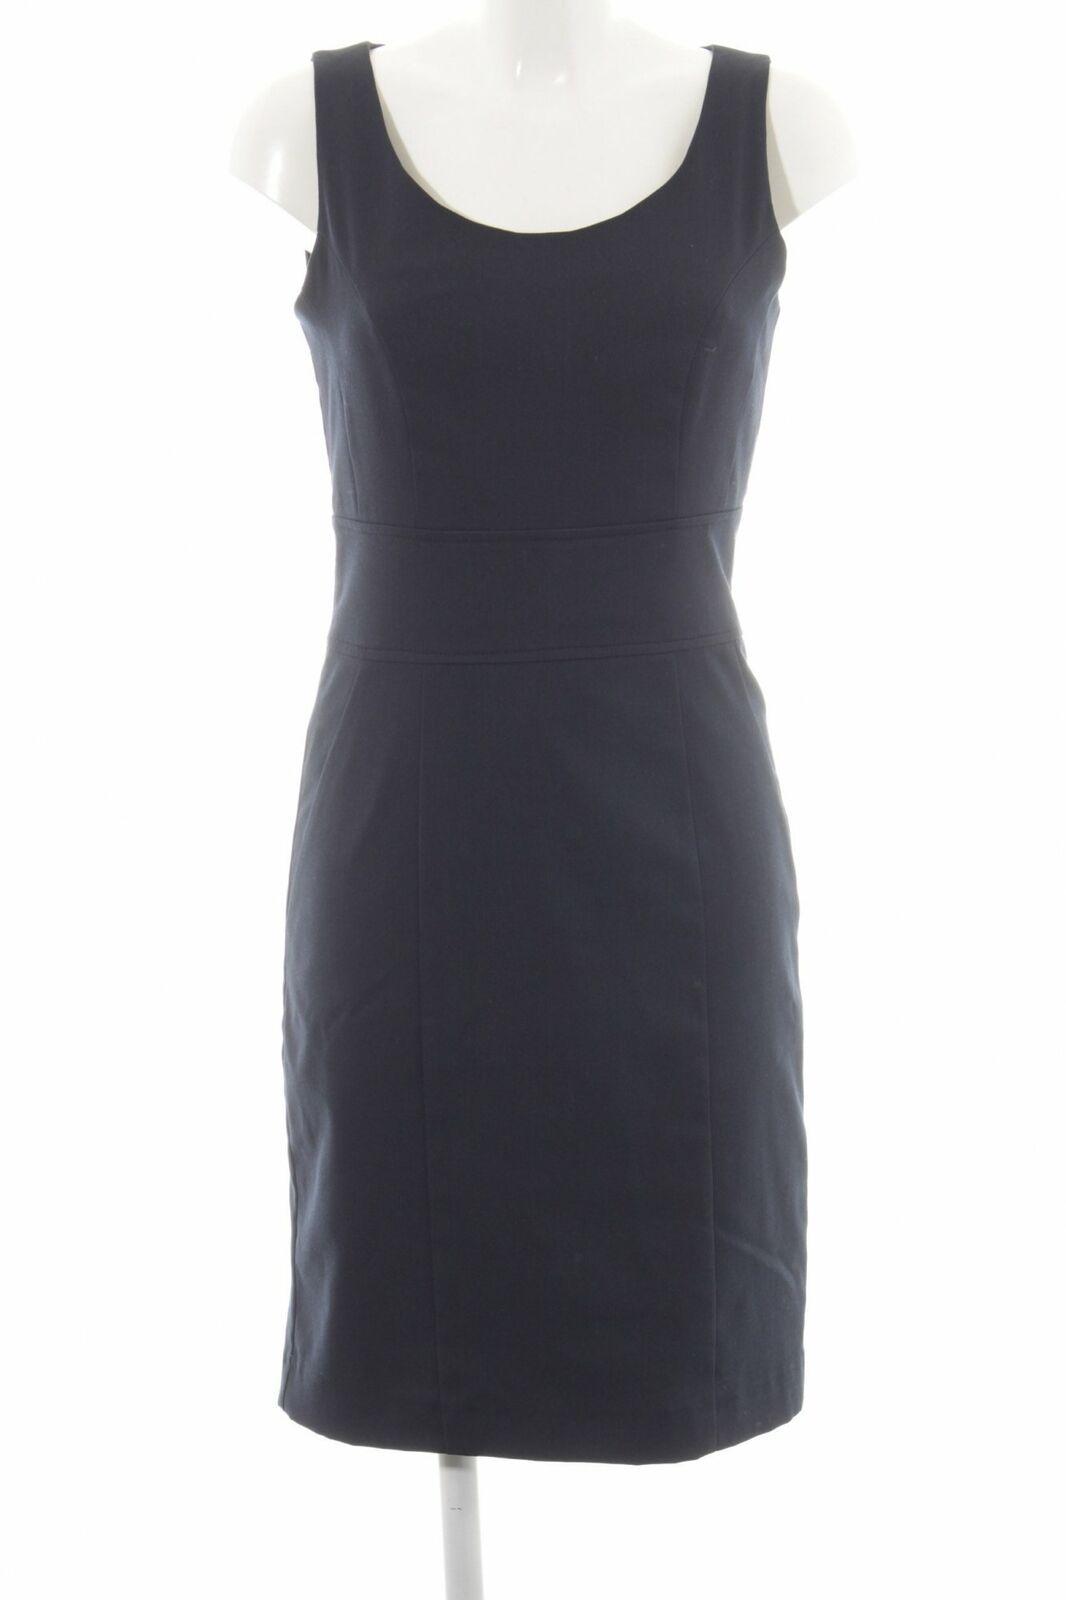 JOHN RICHMOND Abito Damen Kleid Etui Abendkleid Businesskleid Jersey Gr.34-36